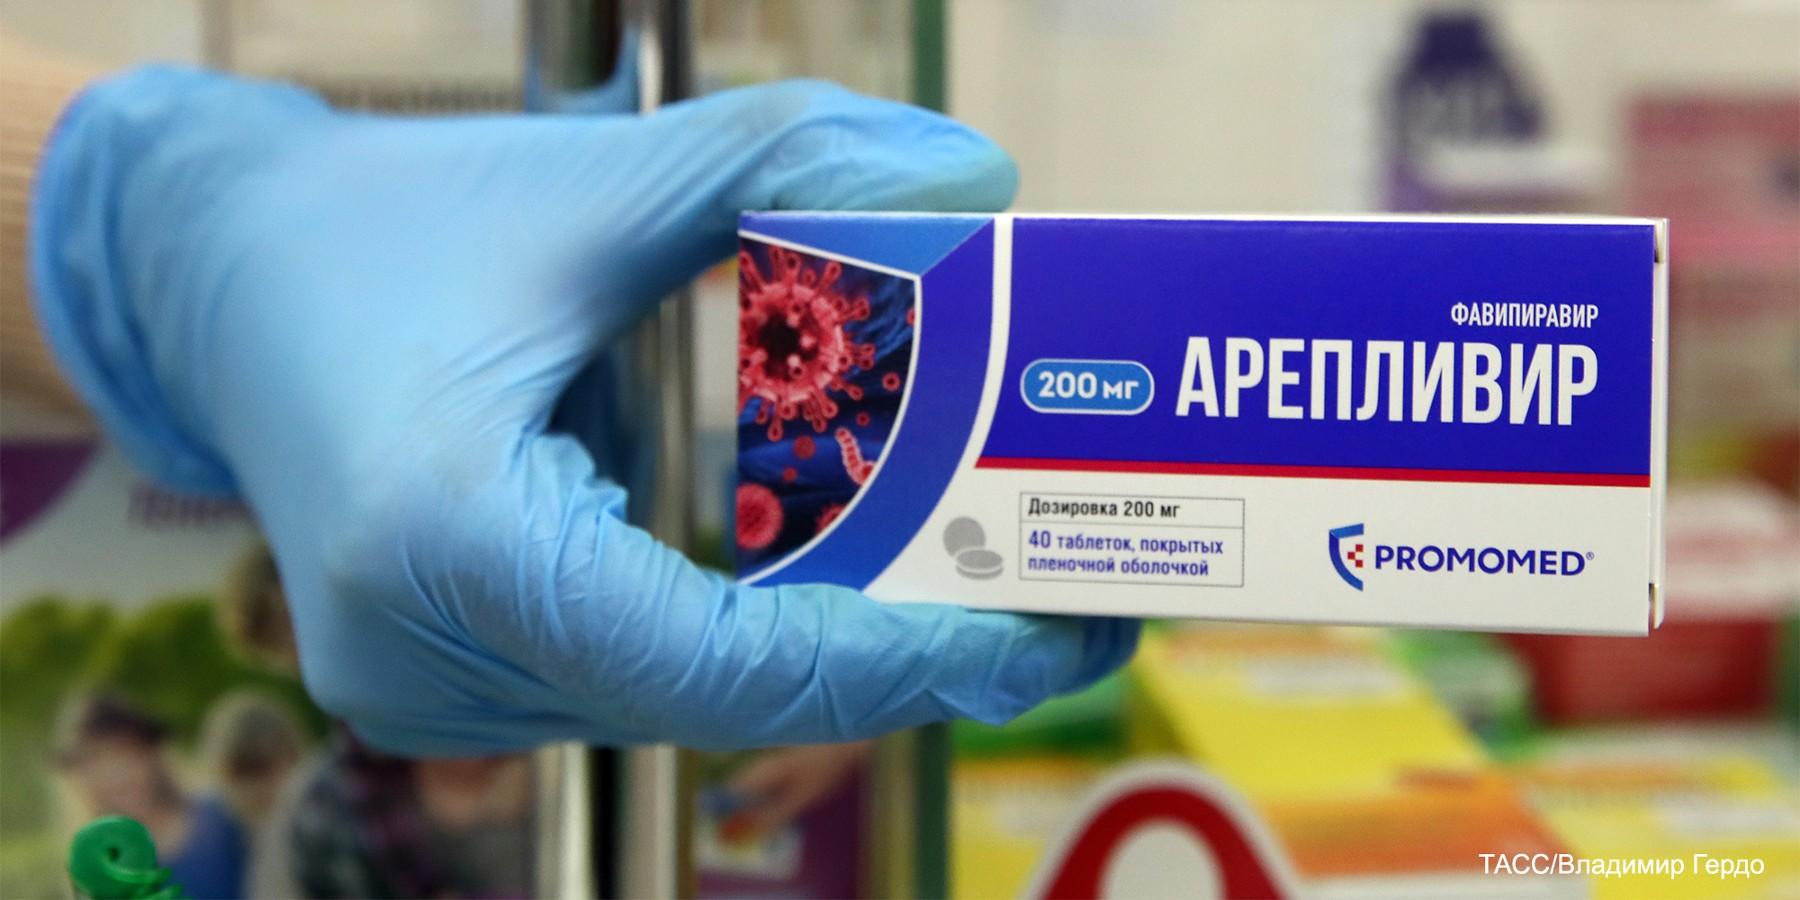 РИА Новости: Г.А. Зюганов раскритиковал цены на препарат от коронавируса «Арепливир»